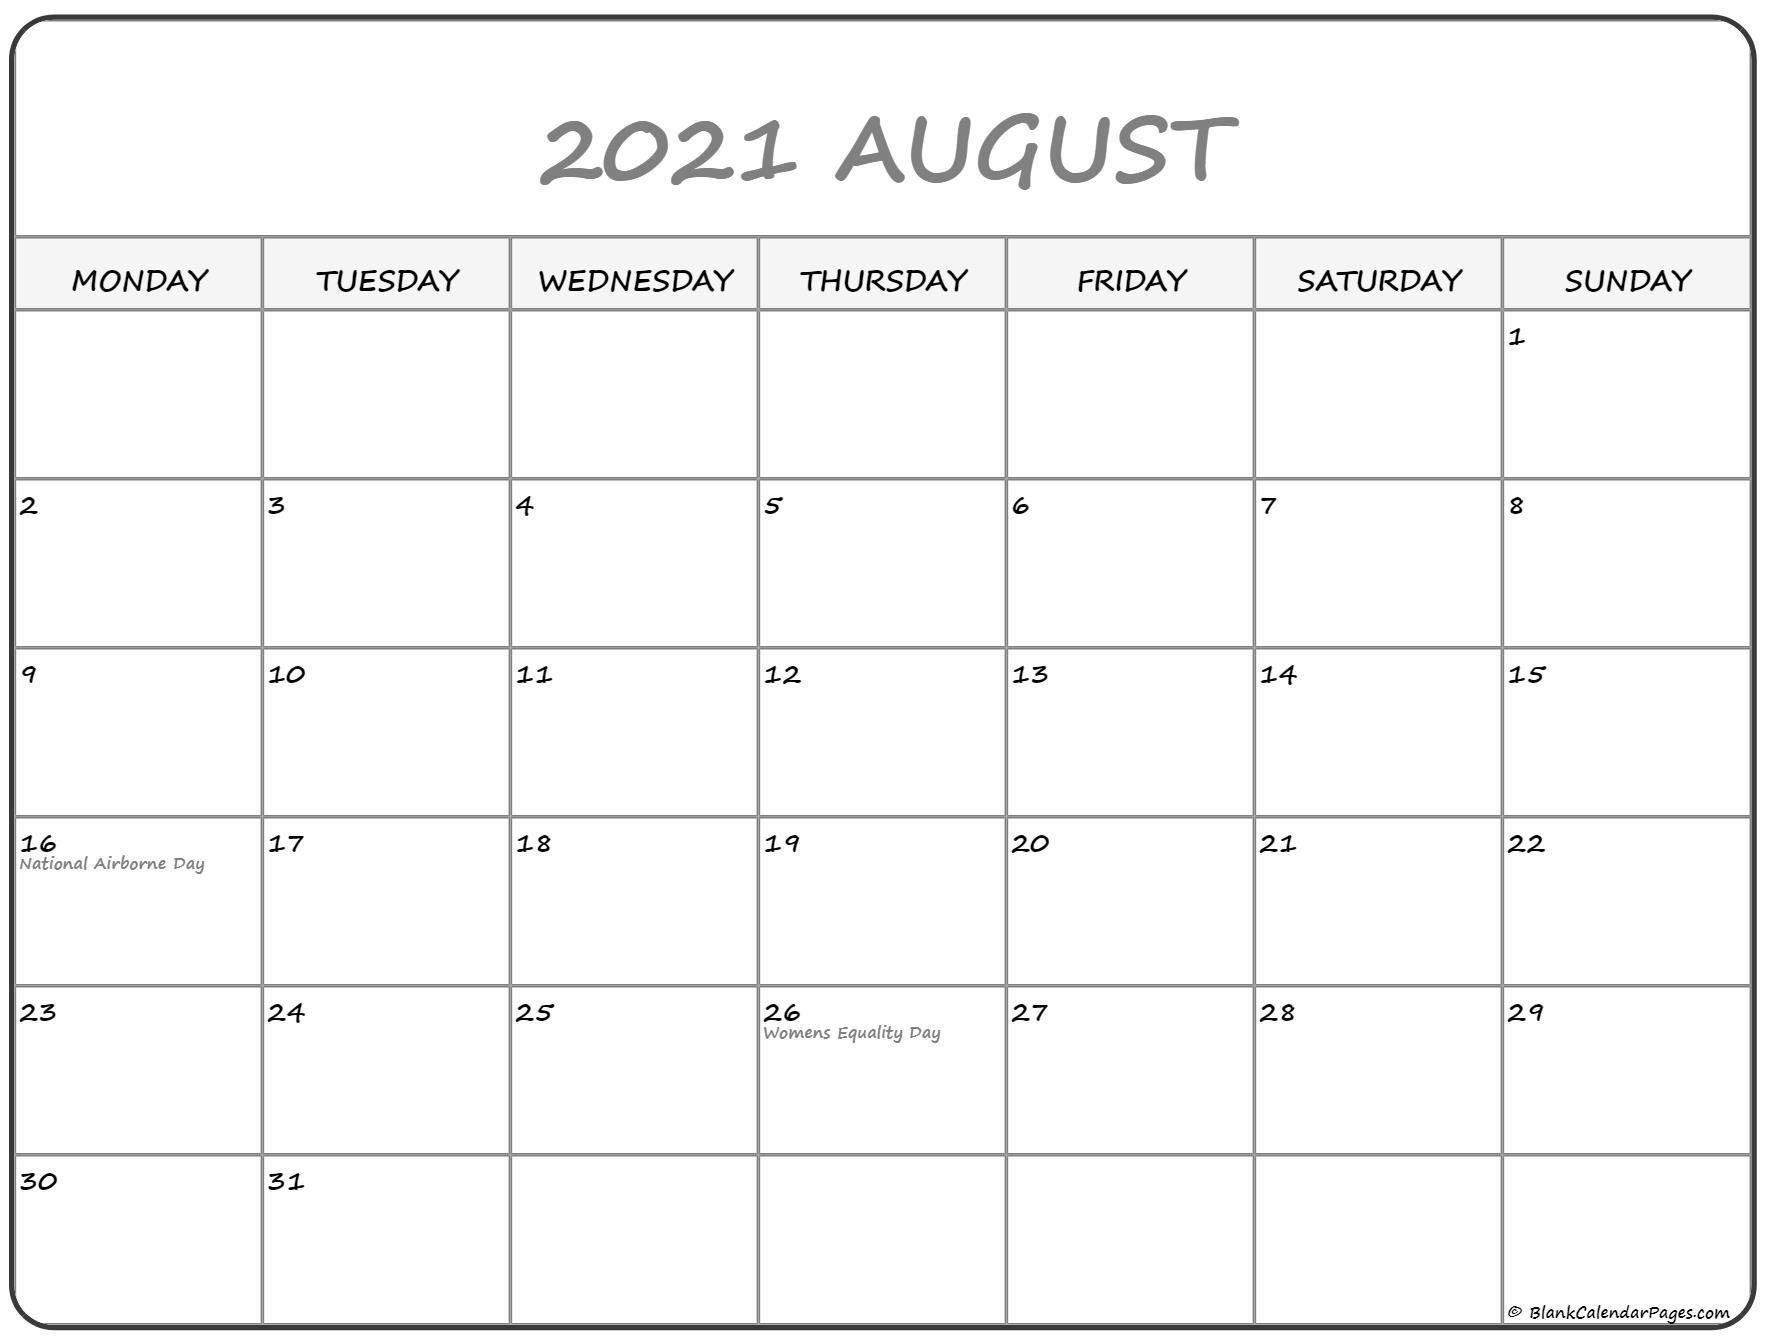 August 2021 Monday Calendar | Monday To Sunday